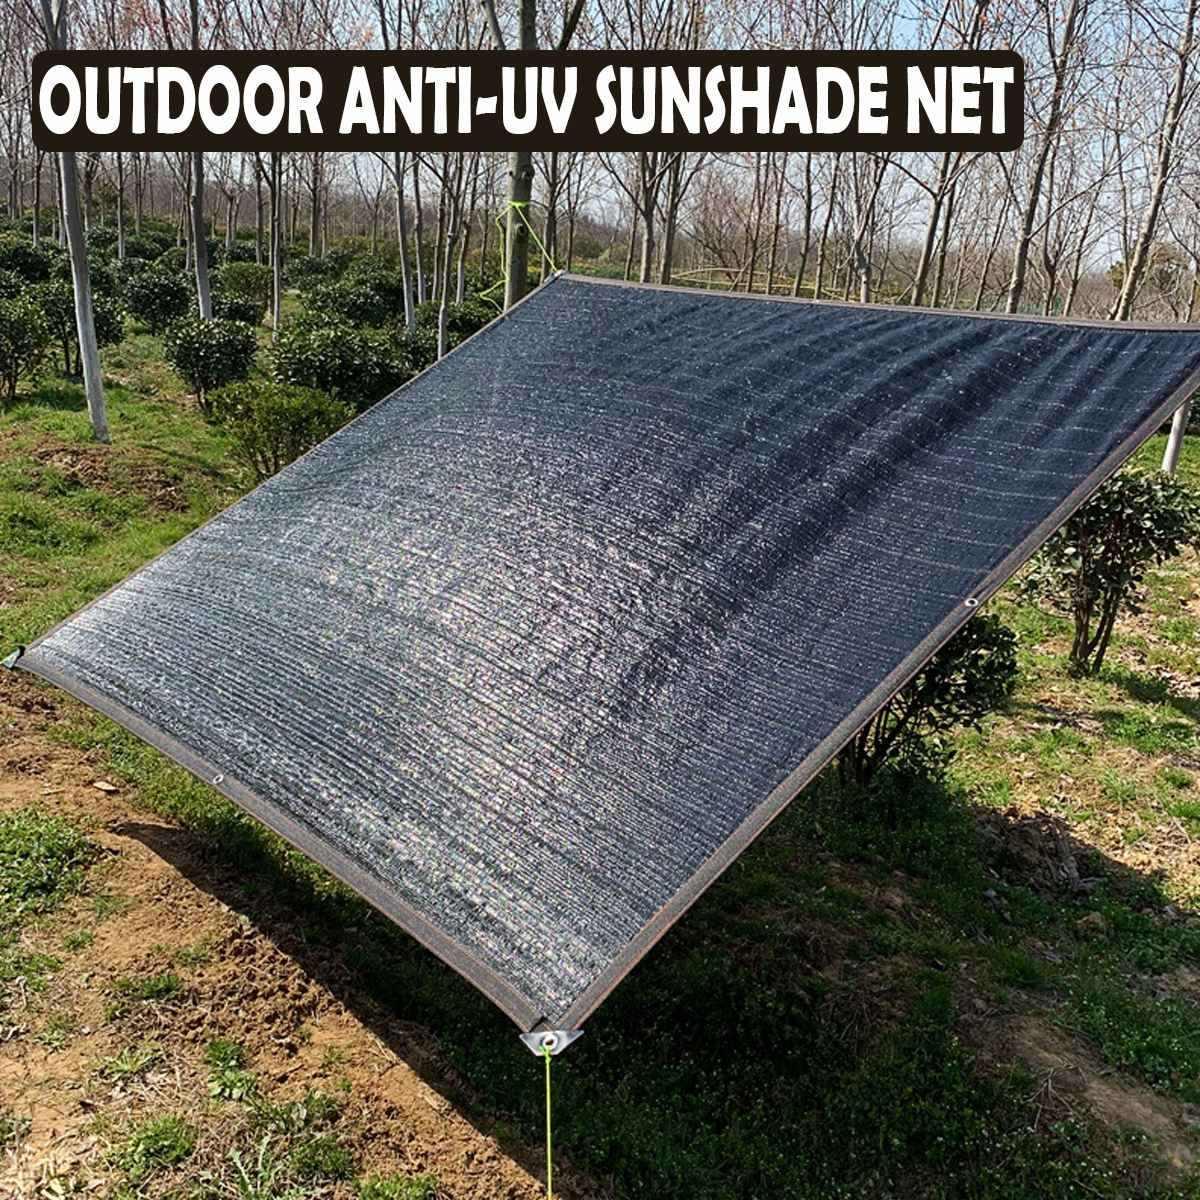 Black Sun Shelter ตาข่าย HDPE สุทธิ Shade Hang Hole สำหรับ Camping สวนเรือนกระจกรถฝาครอบกันสาด